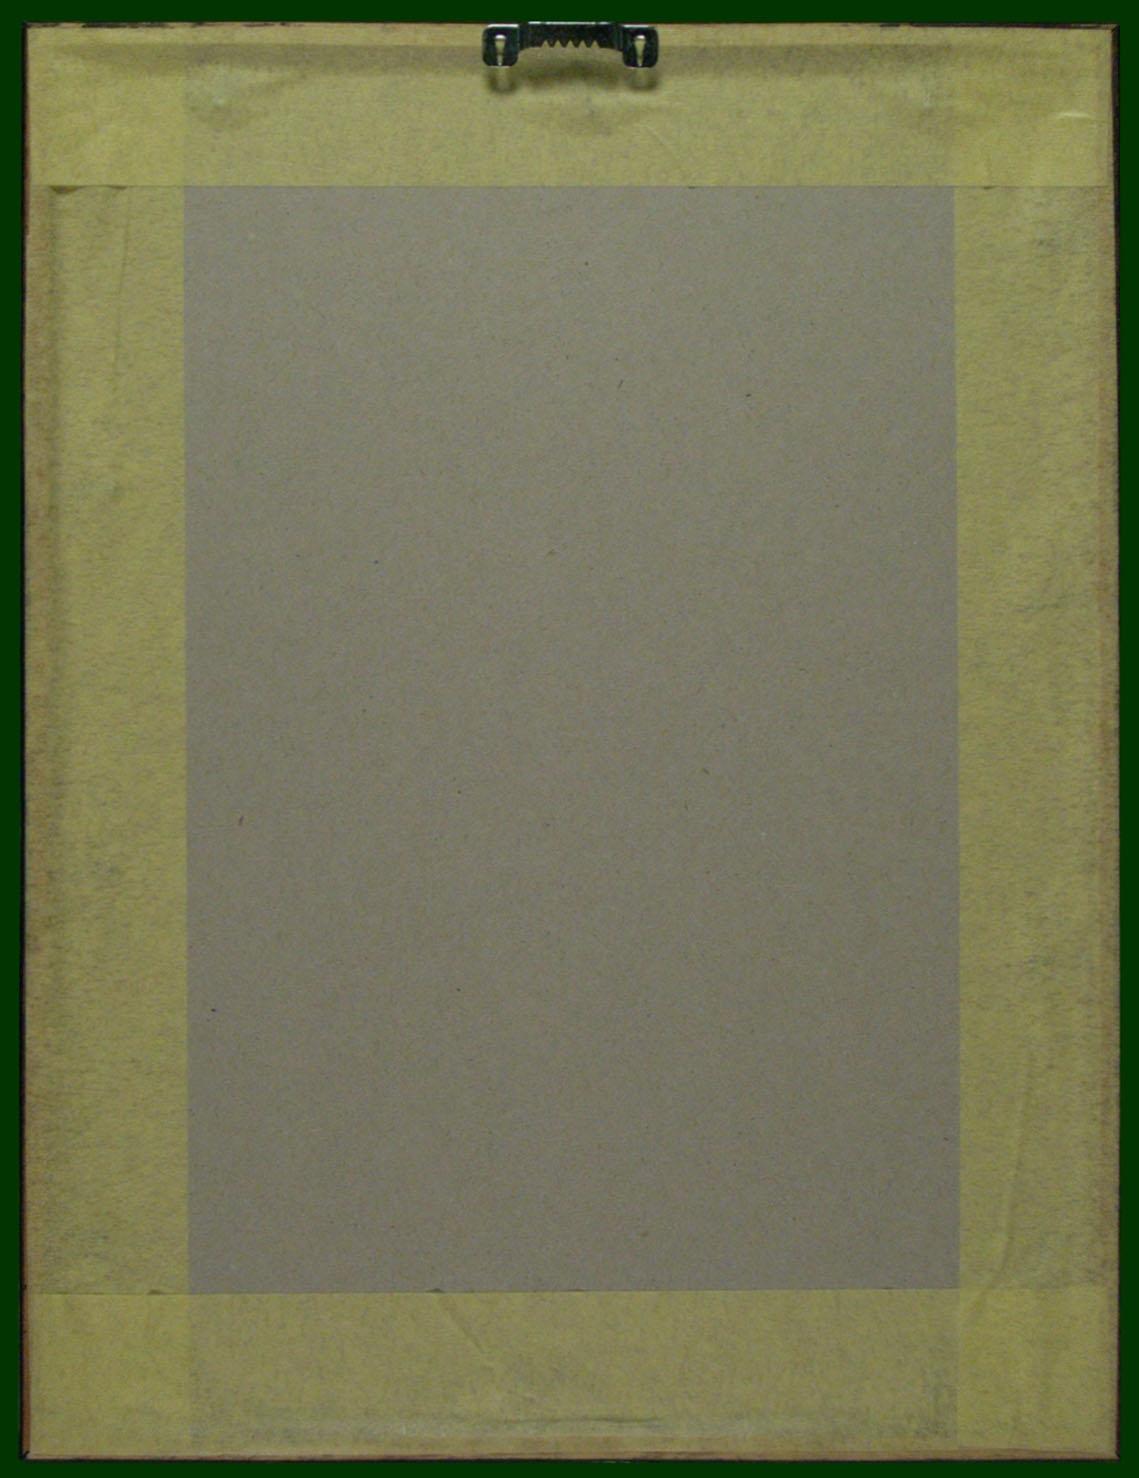 095-018h.JPG (1139×1478)